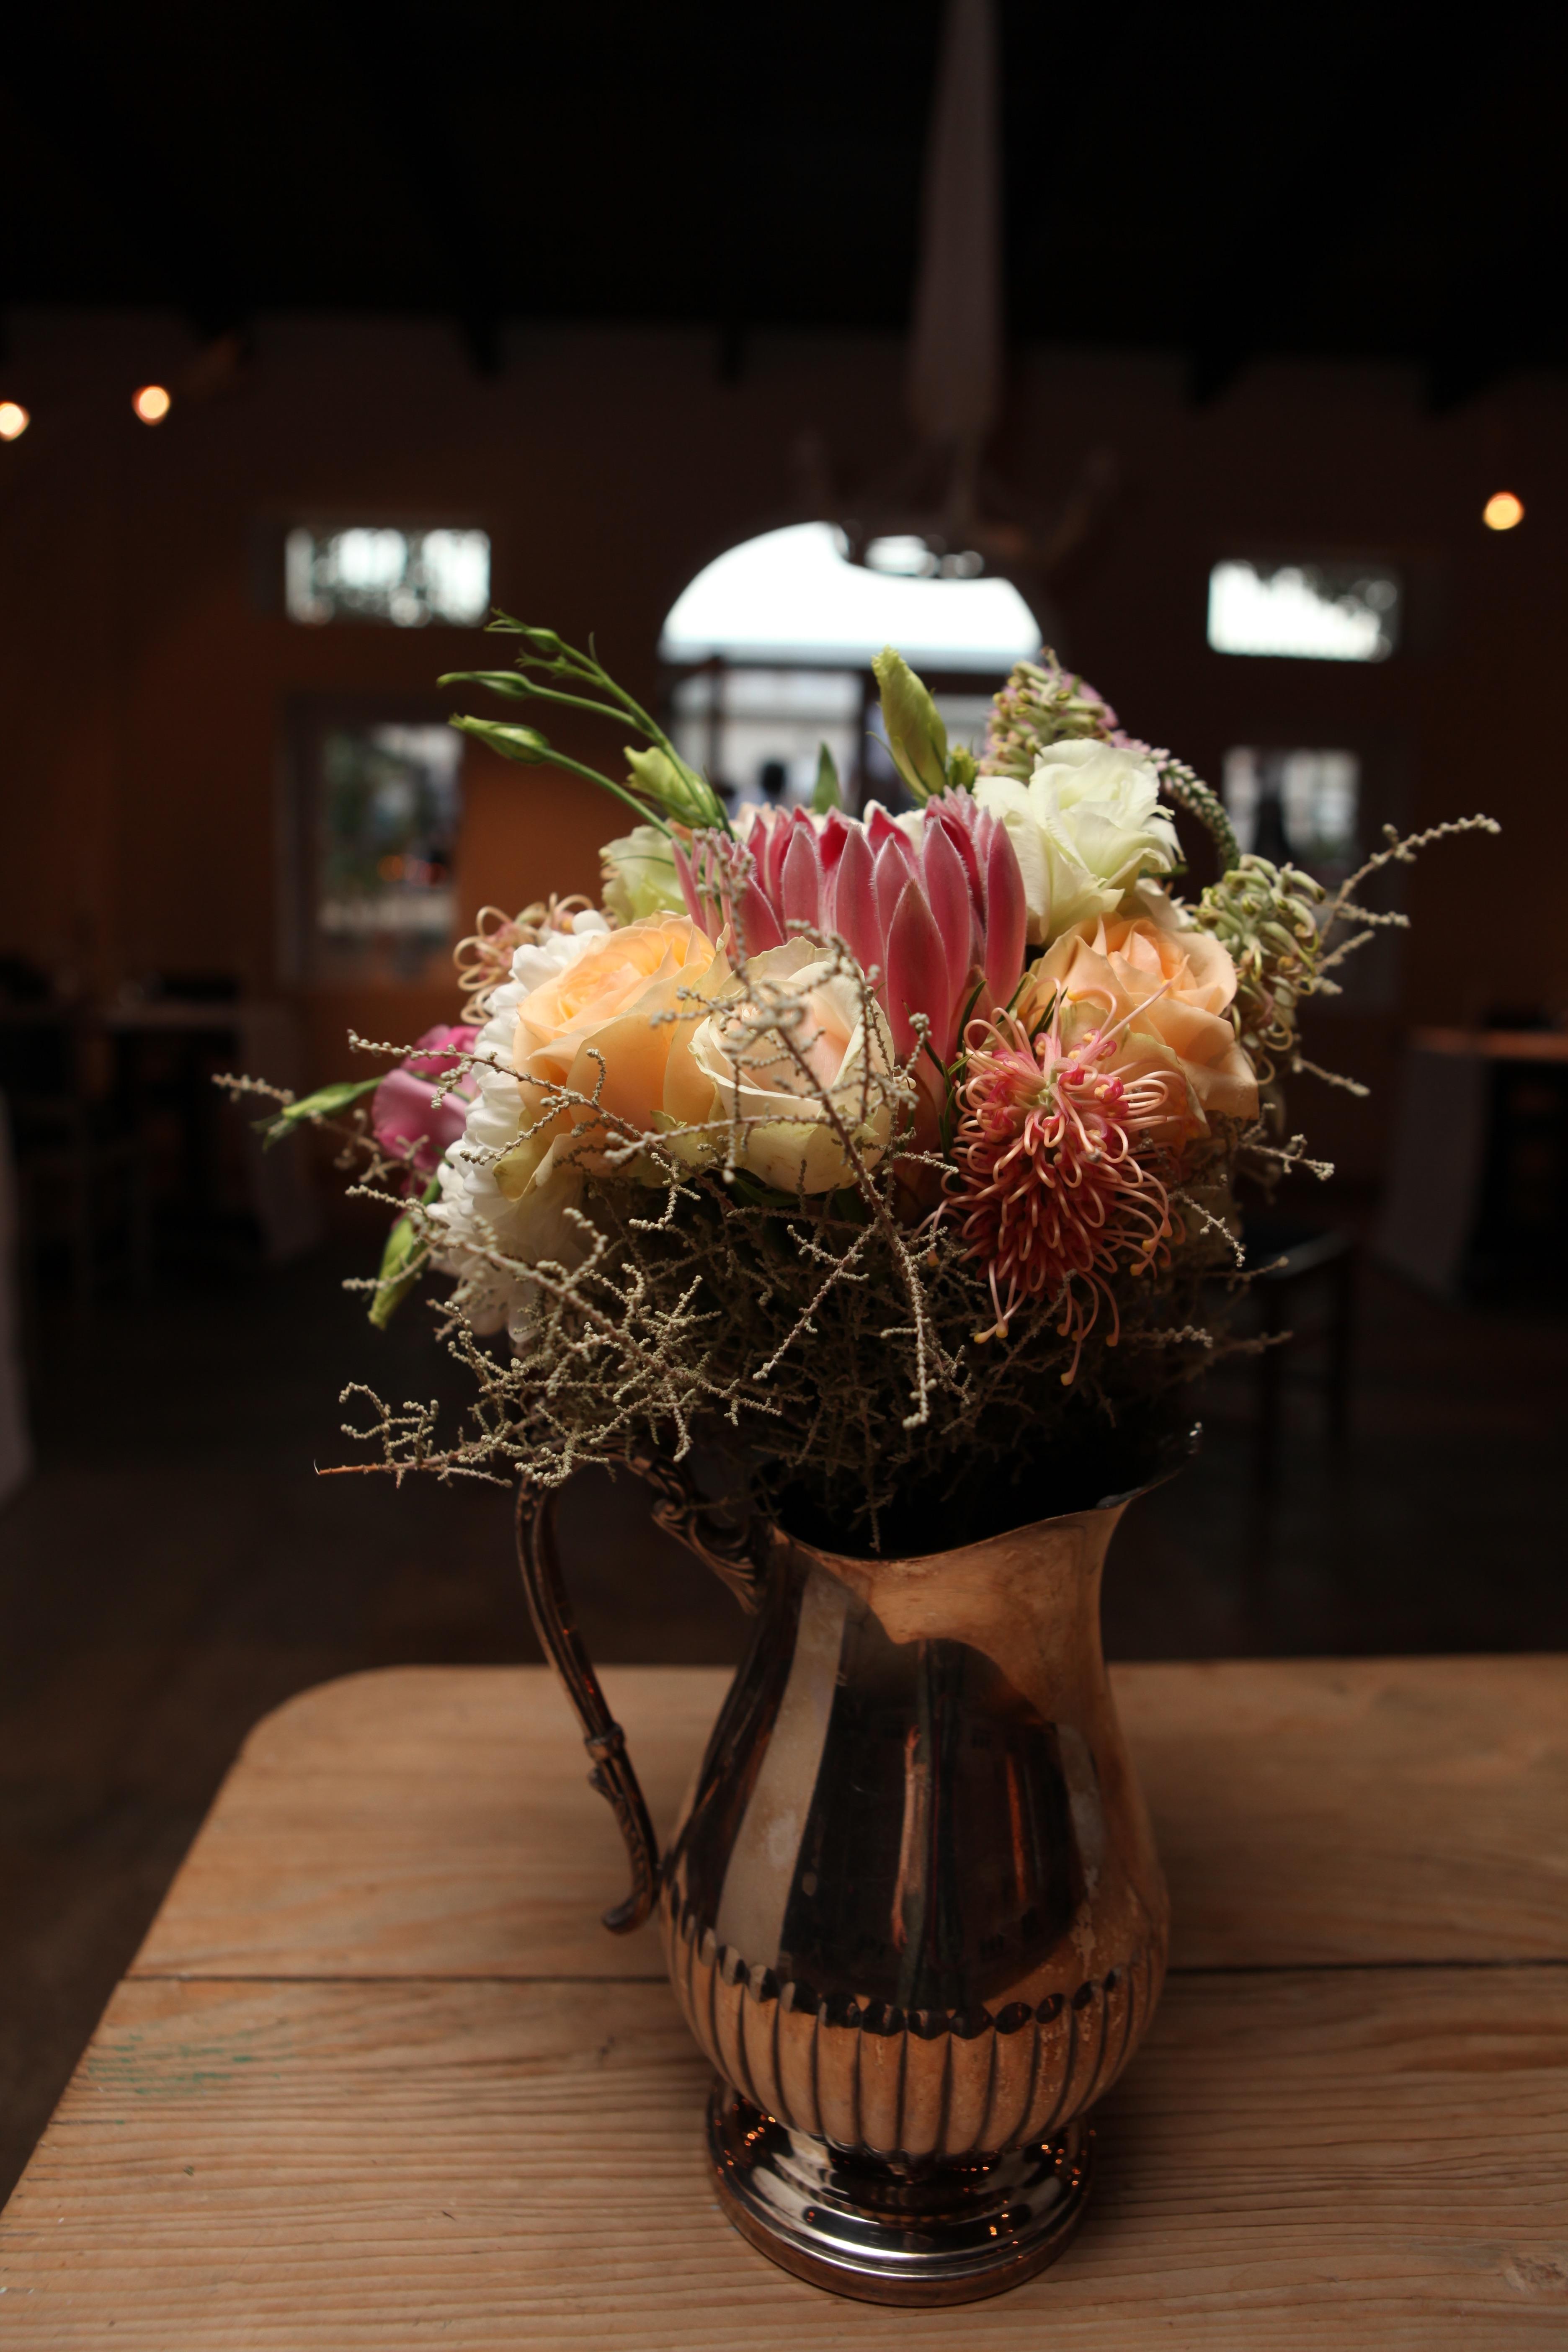 Gambar menanam musim semi kuning berwarna merah muda #4: plant flower spring red yellow pink lighting art floristry flower bouquet floral design centrepiece flower arranging